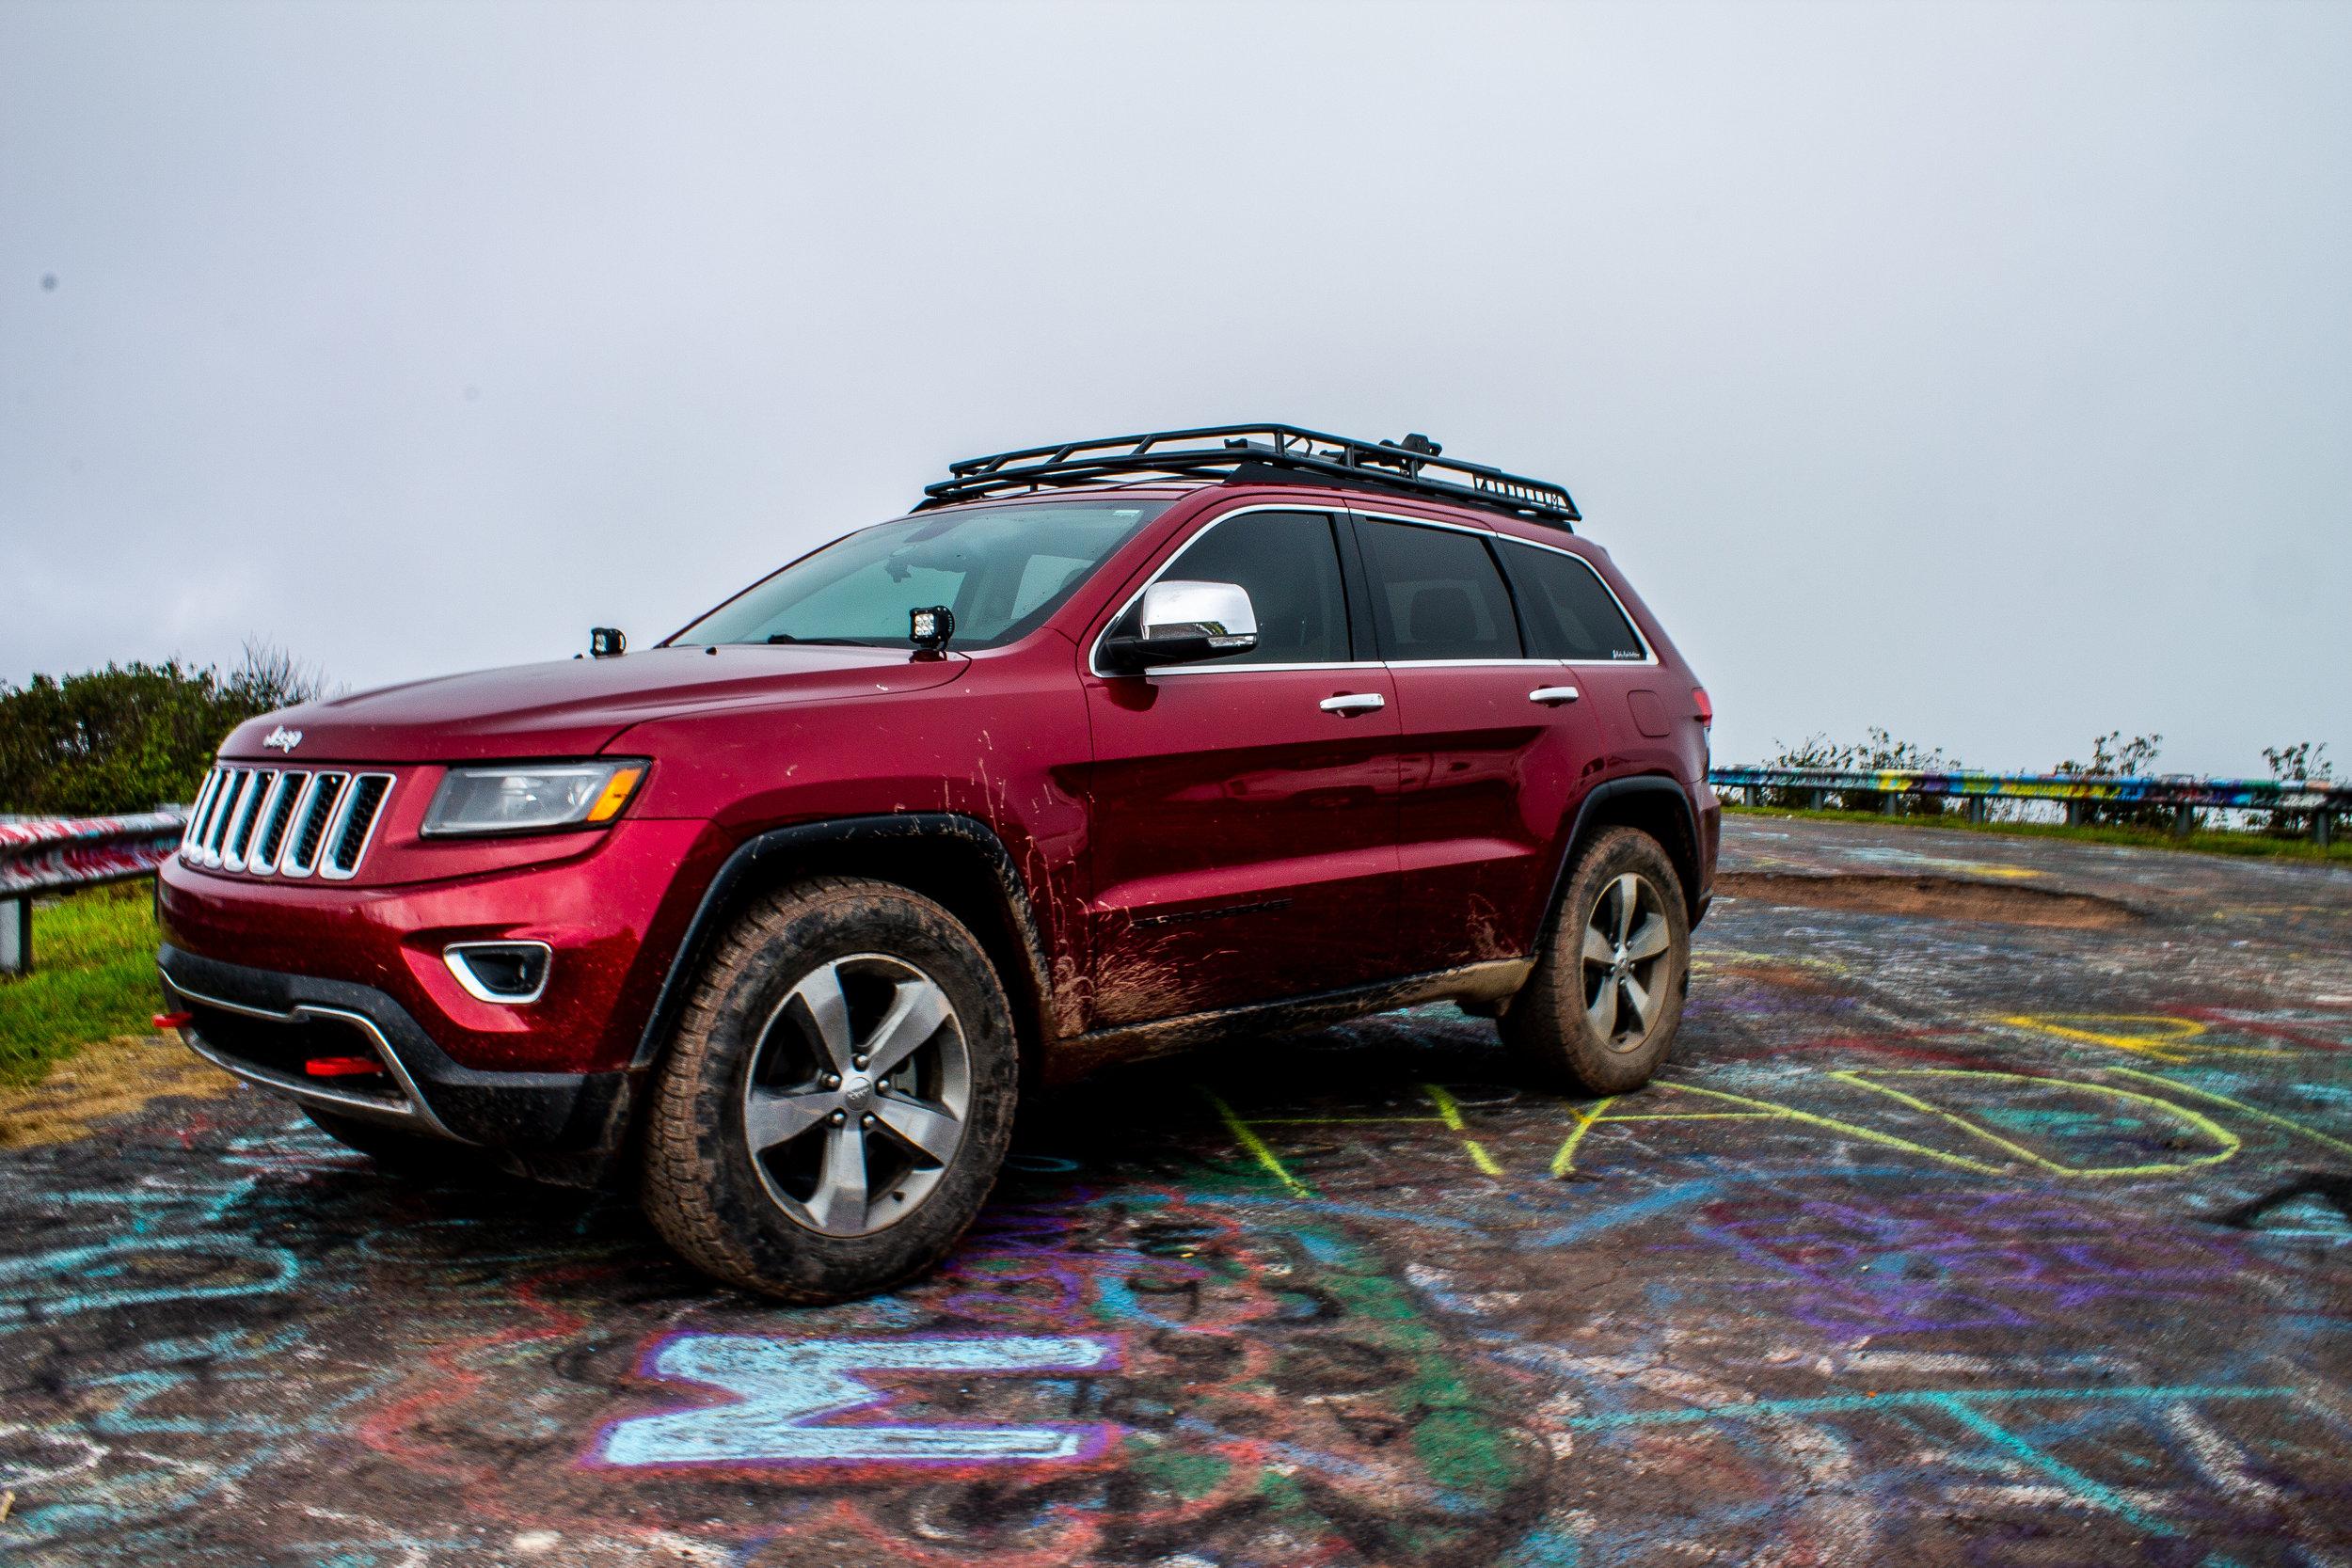 Jeep-Grand-Cherokee-Roof-Rack-Drivers-Side-Low-Profile